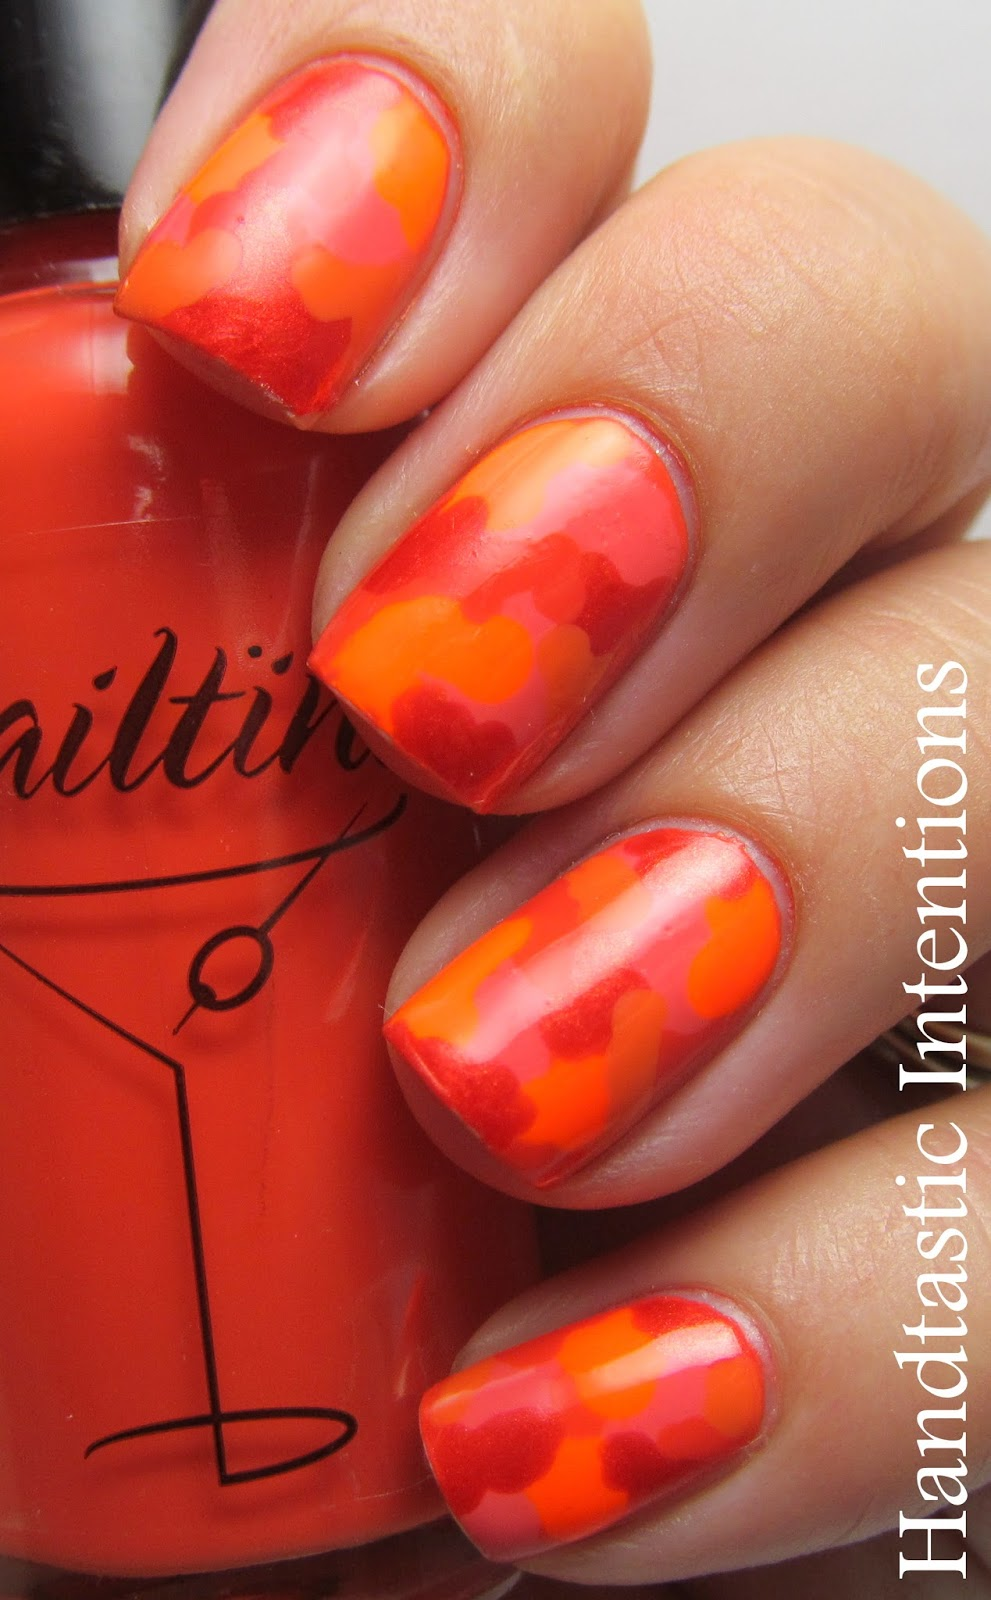 Handtastic Intentions Nail Art Orange Camo